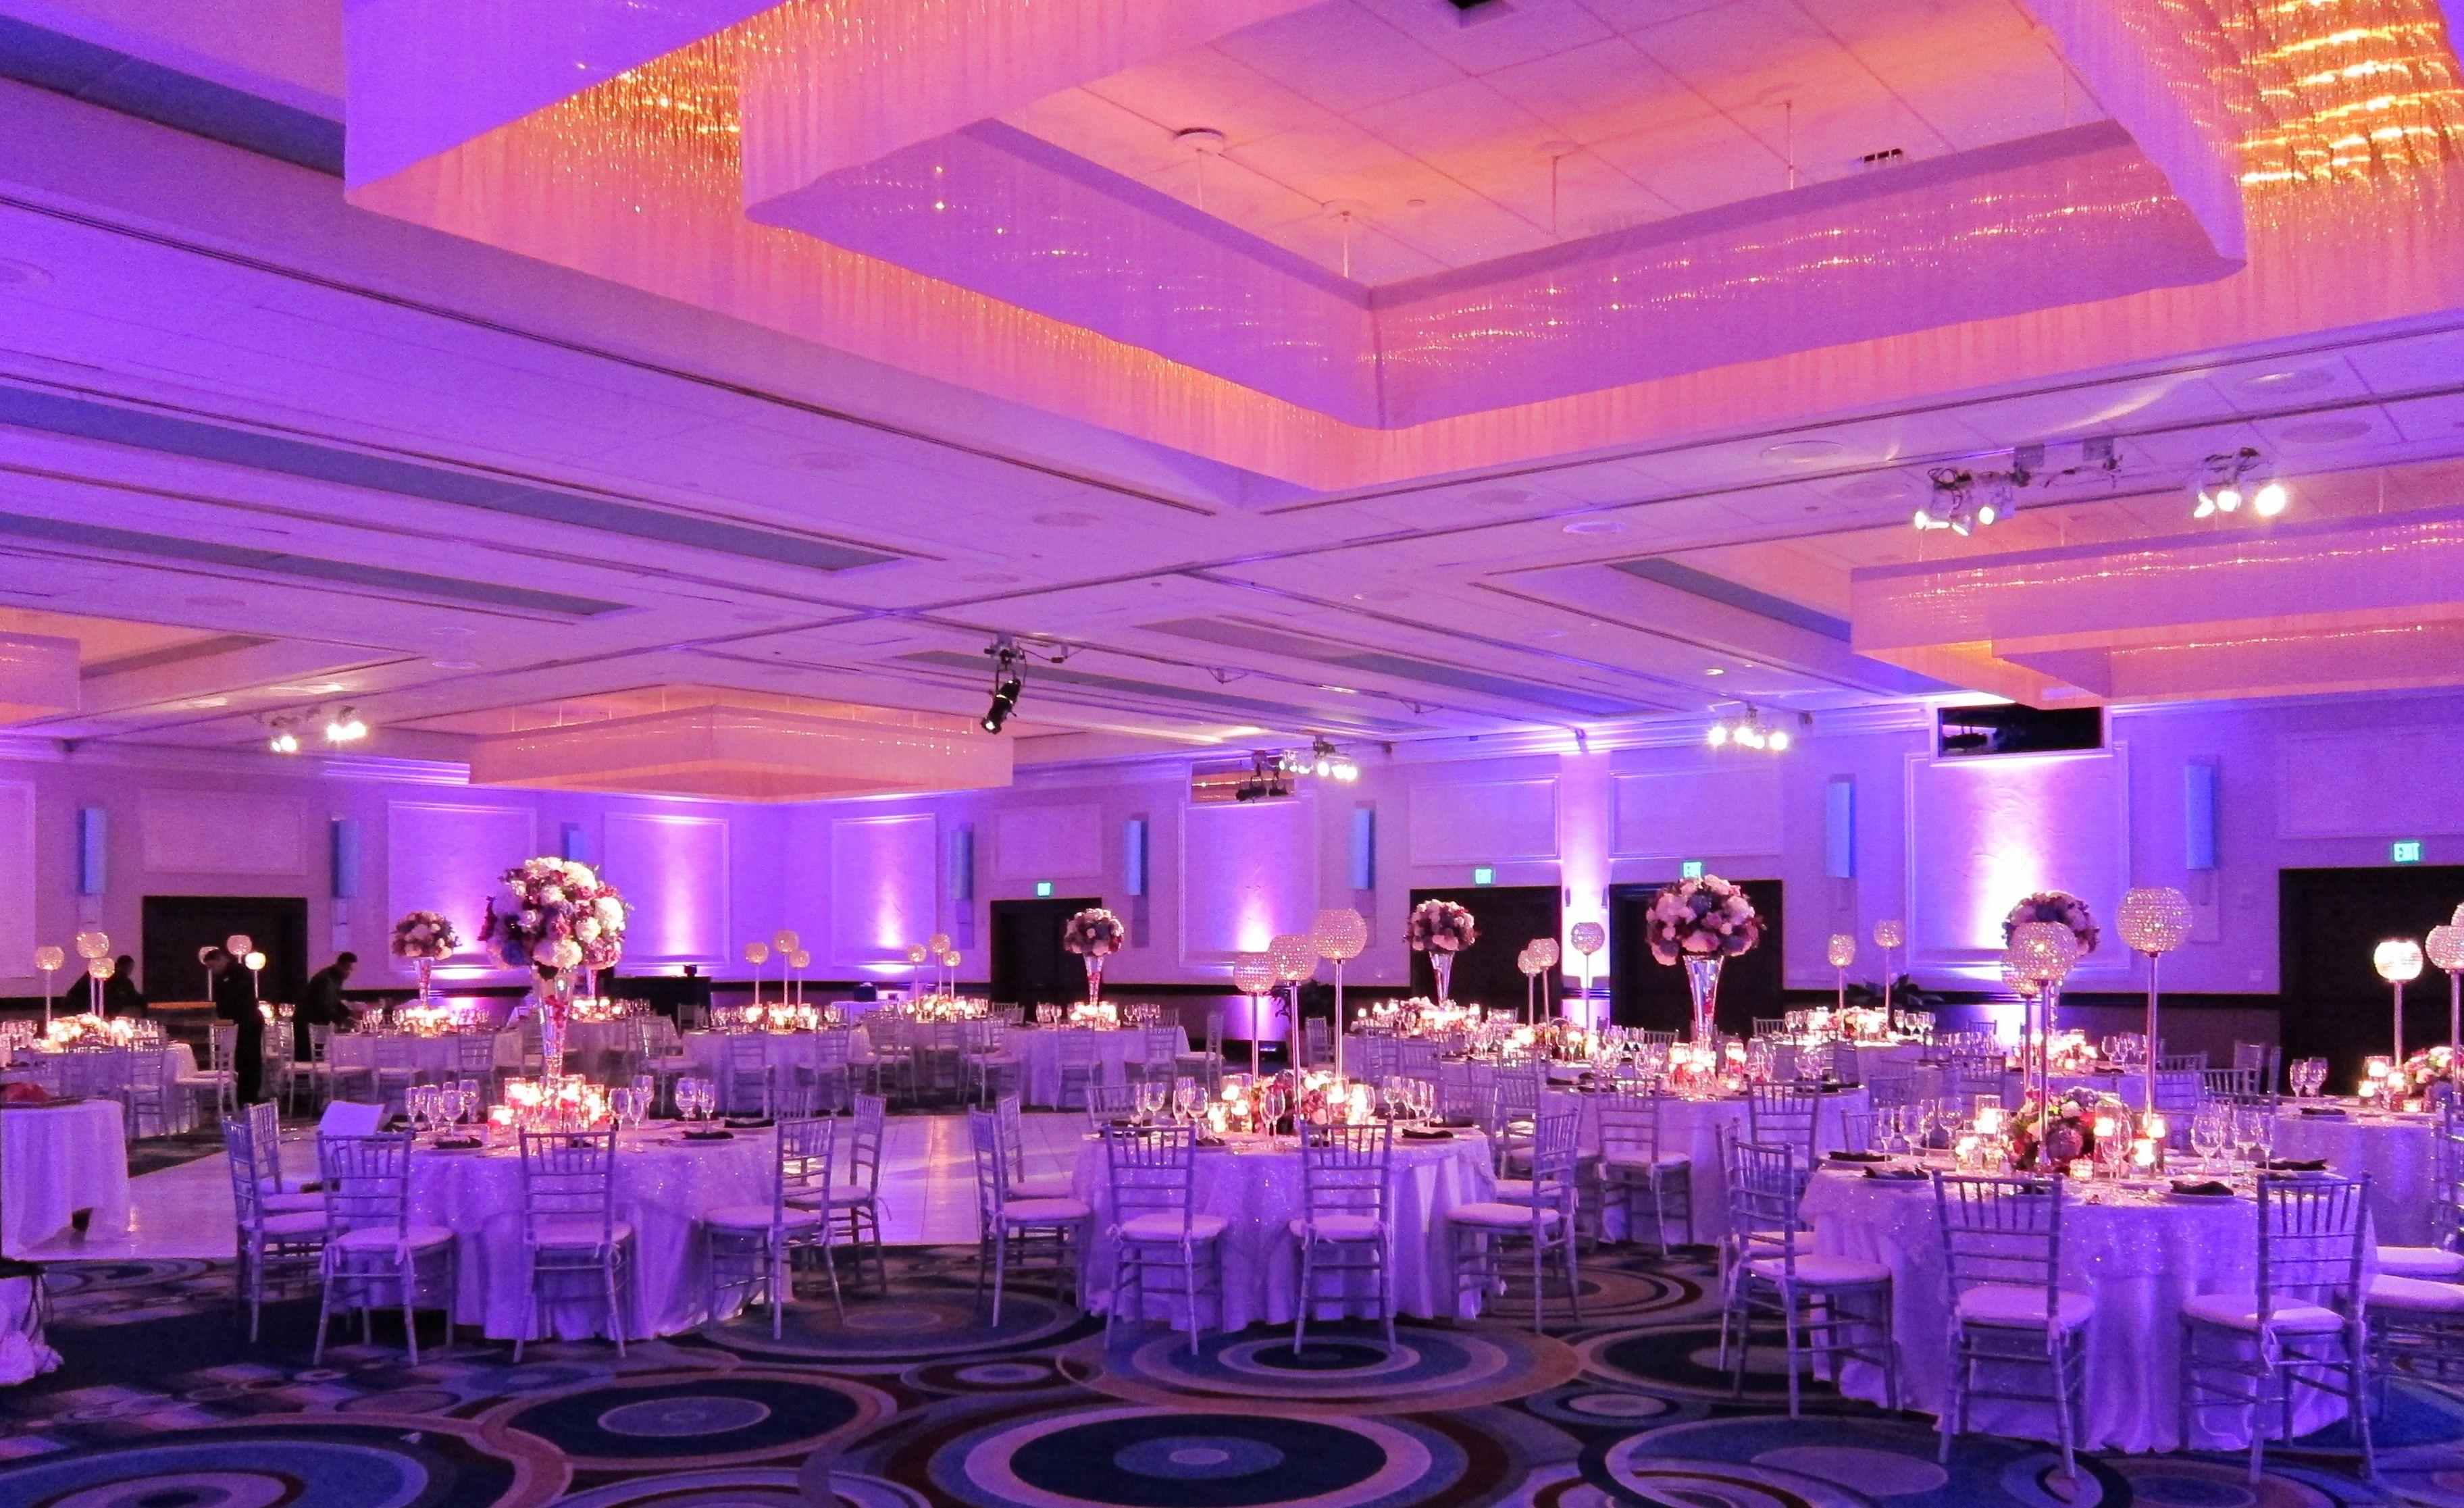 Purple Up Lighting   Wedding Lighting   Pinterest   Iluminación y ...